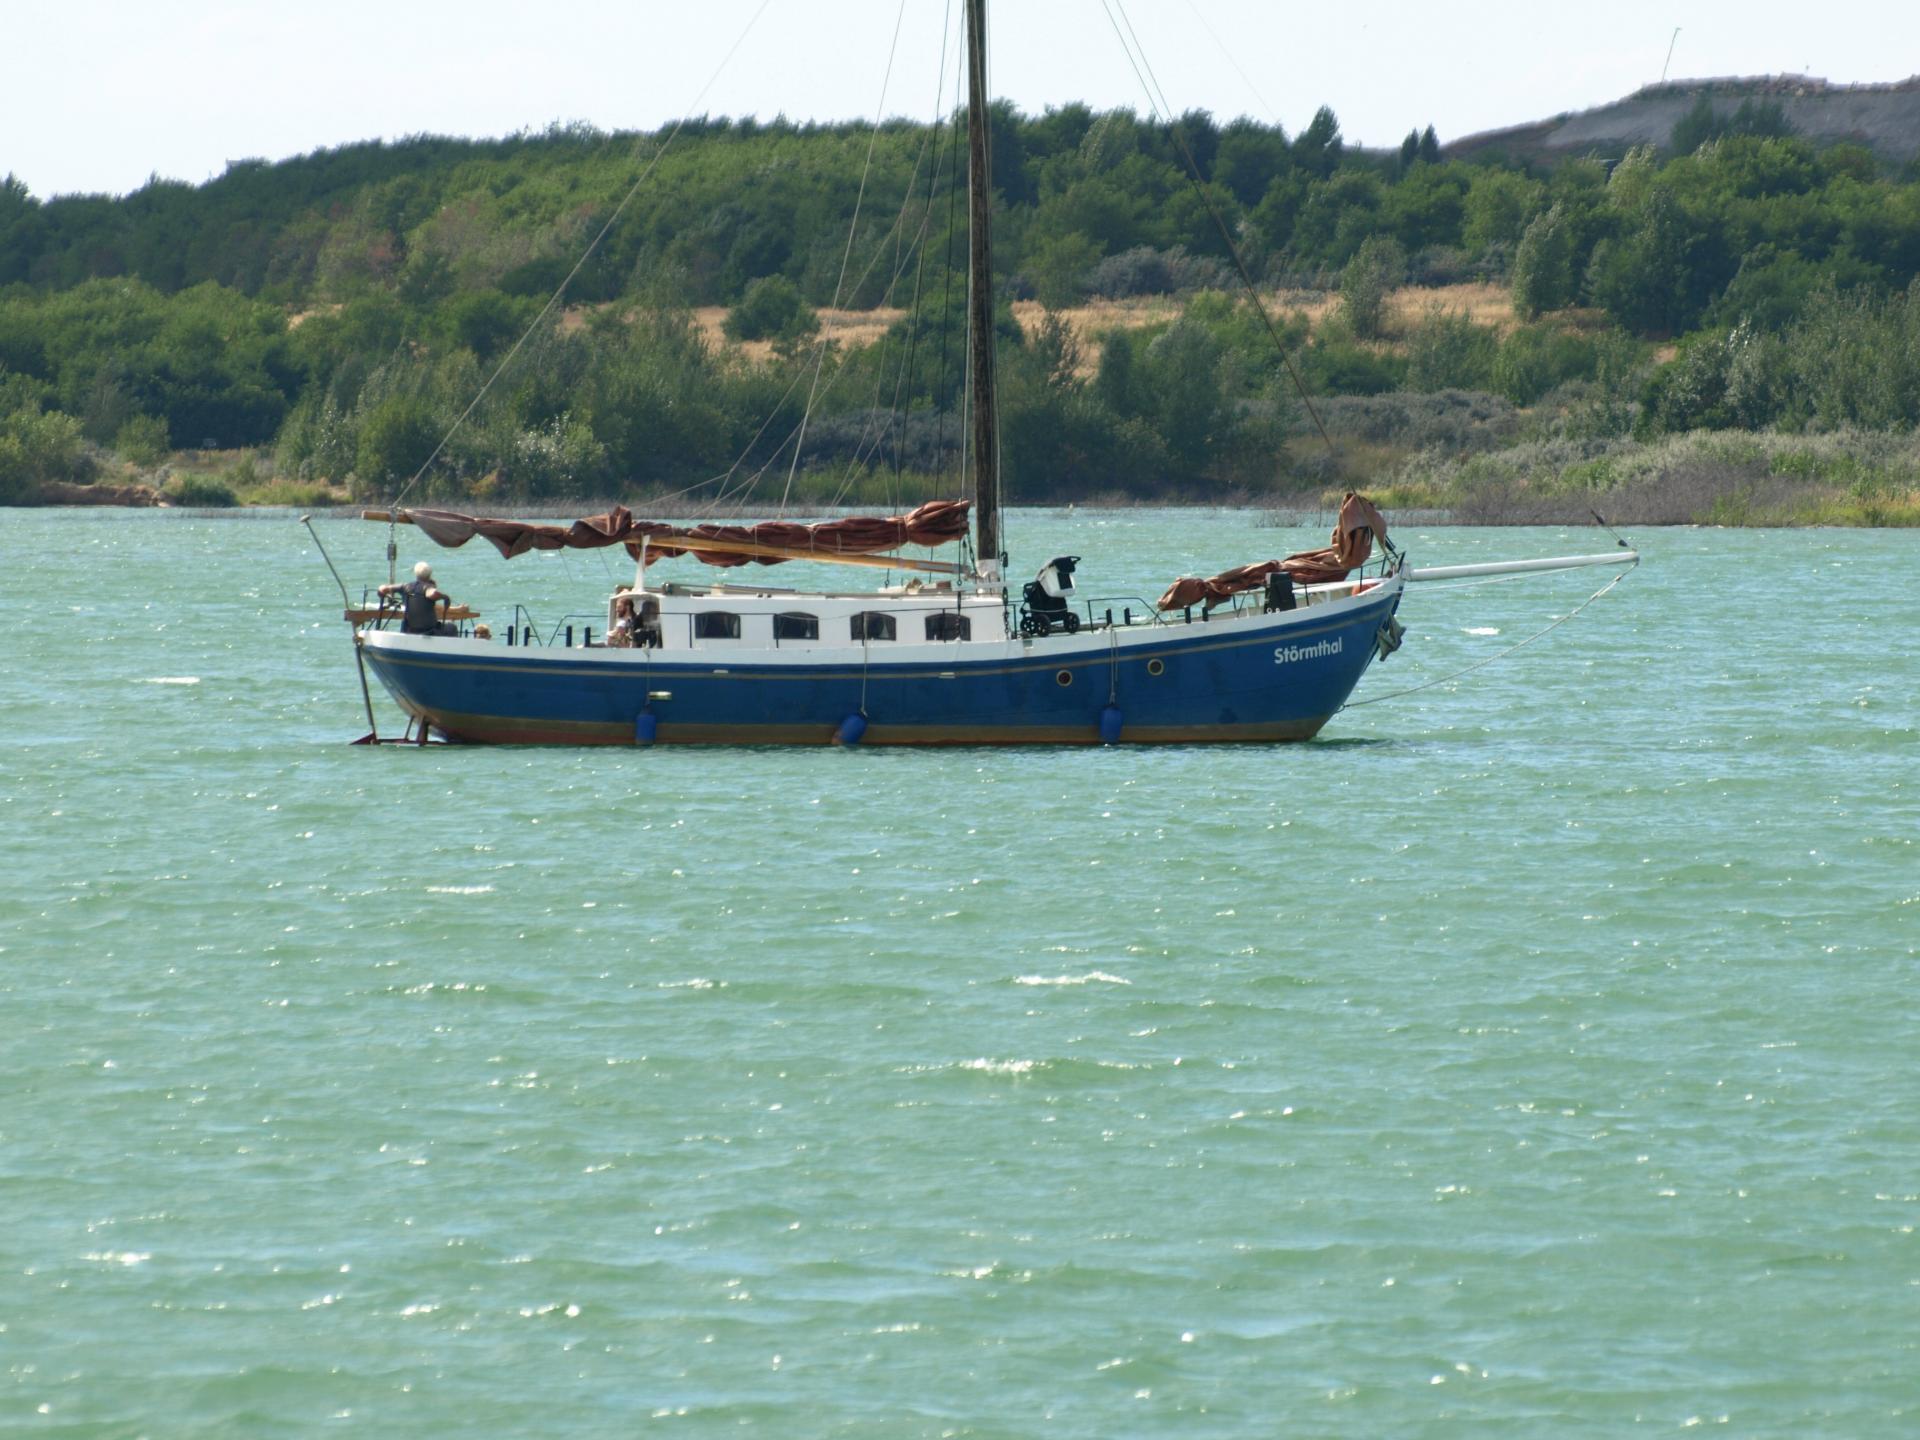 Schiff Störmthaler See